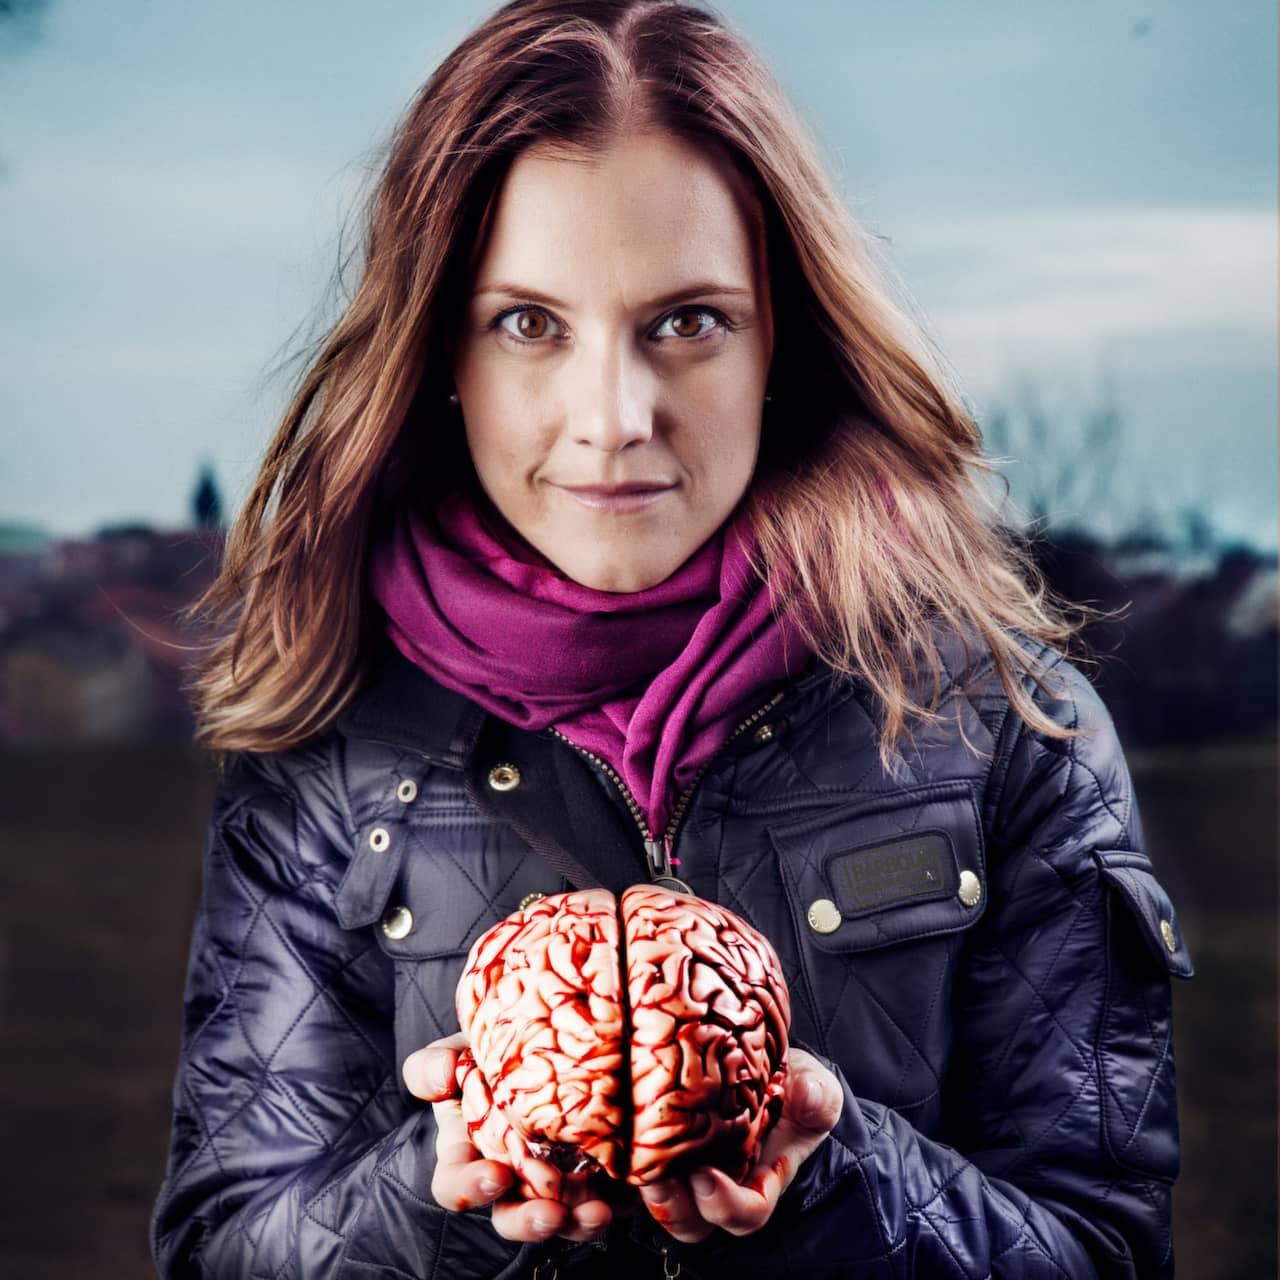 81. Katarina Gospic